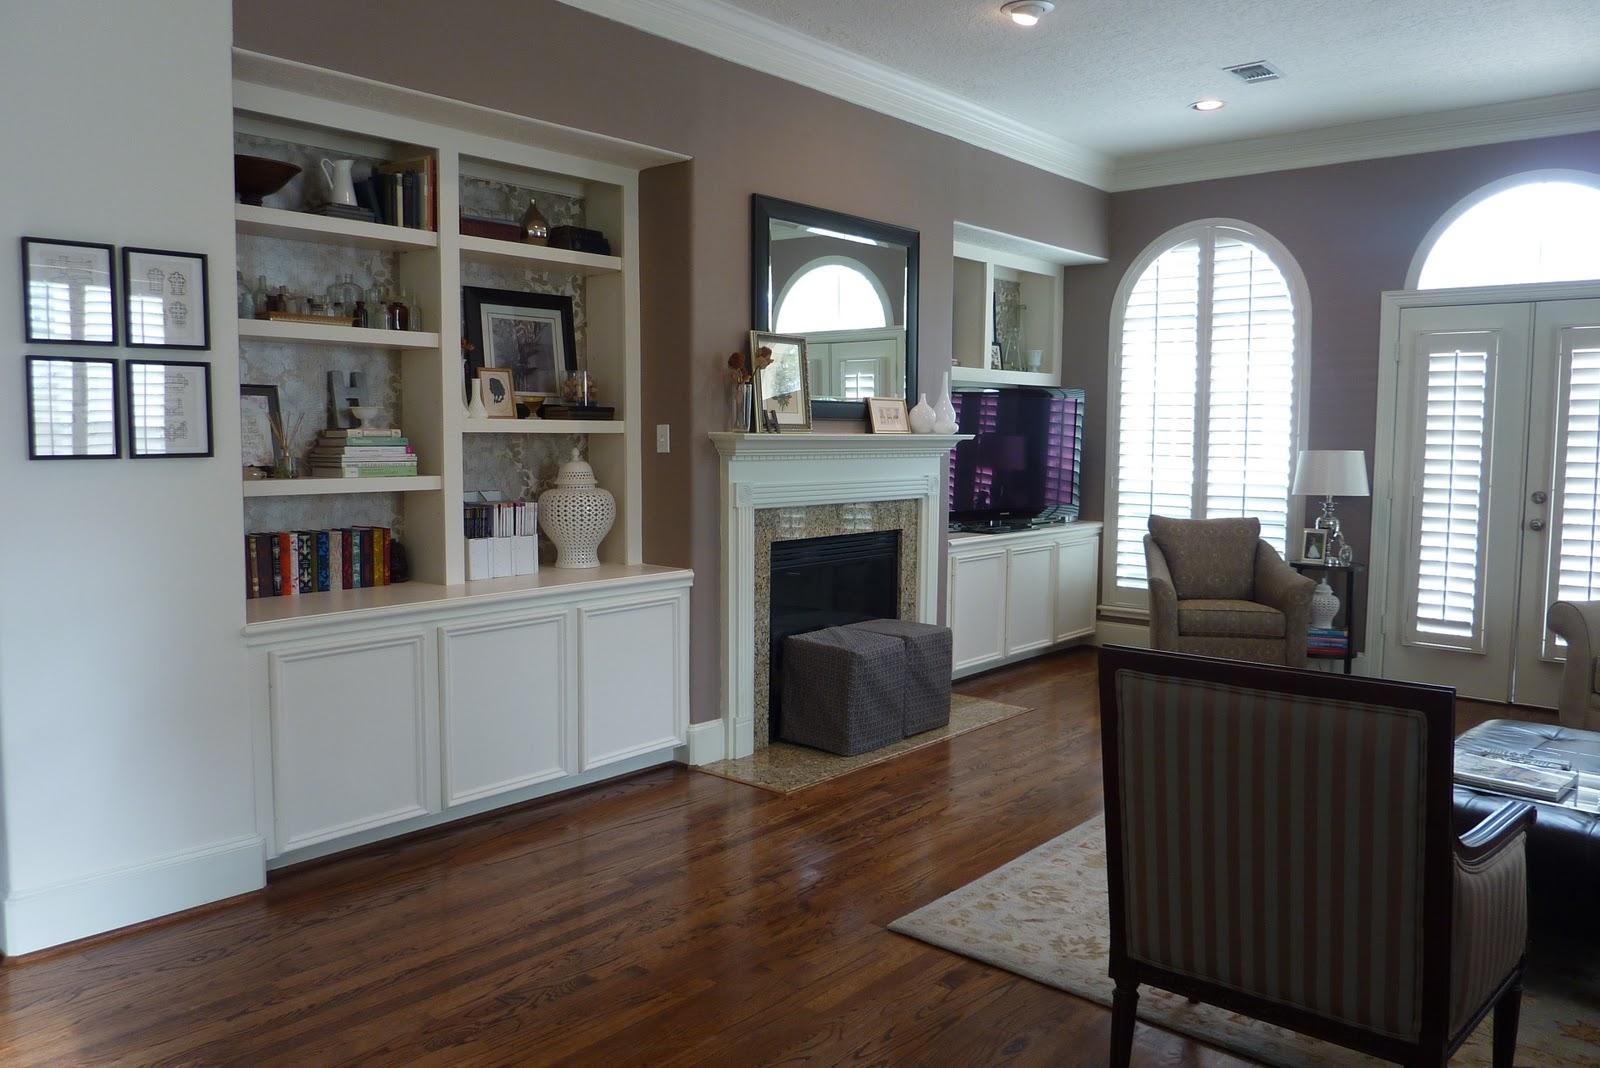 Living room furniture names - Monday January 23 2012 Name 5 Things House Tour Living Room